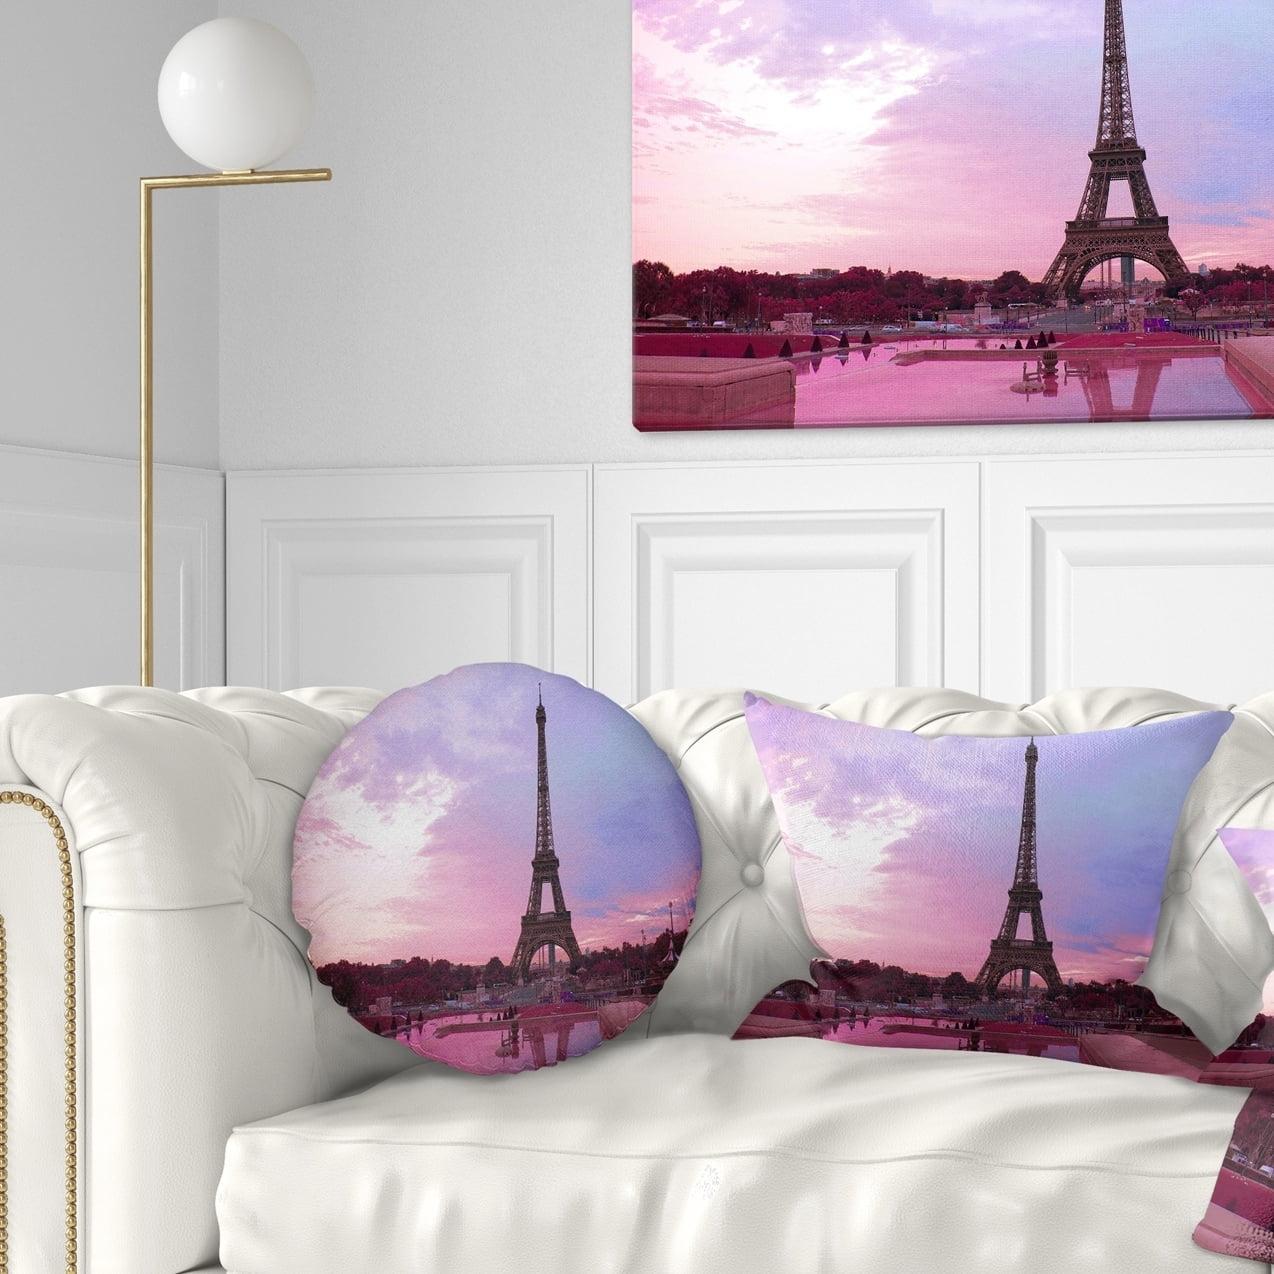 Designart CU9266-20-20-C Paris Eiffel Towerin Purple Tone Landscape Photography Throw Pillow 20